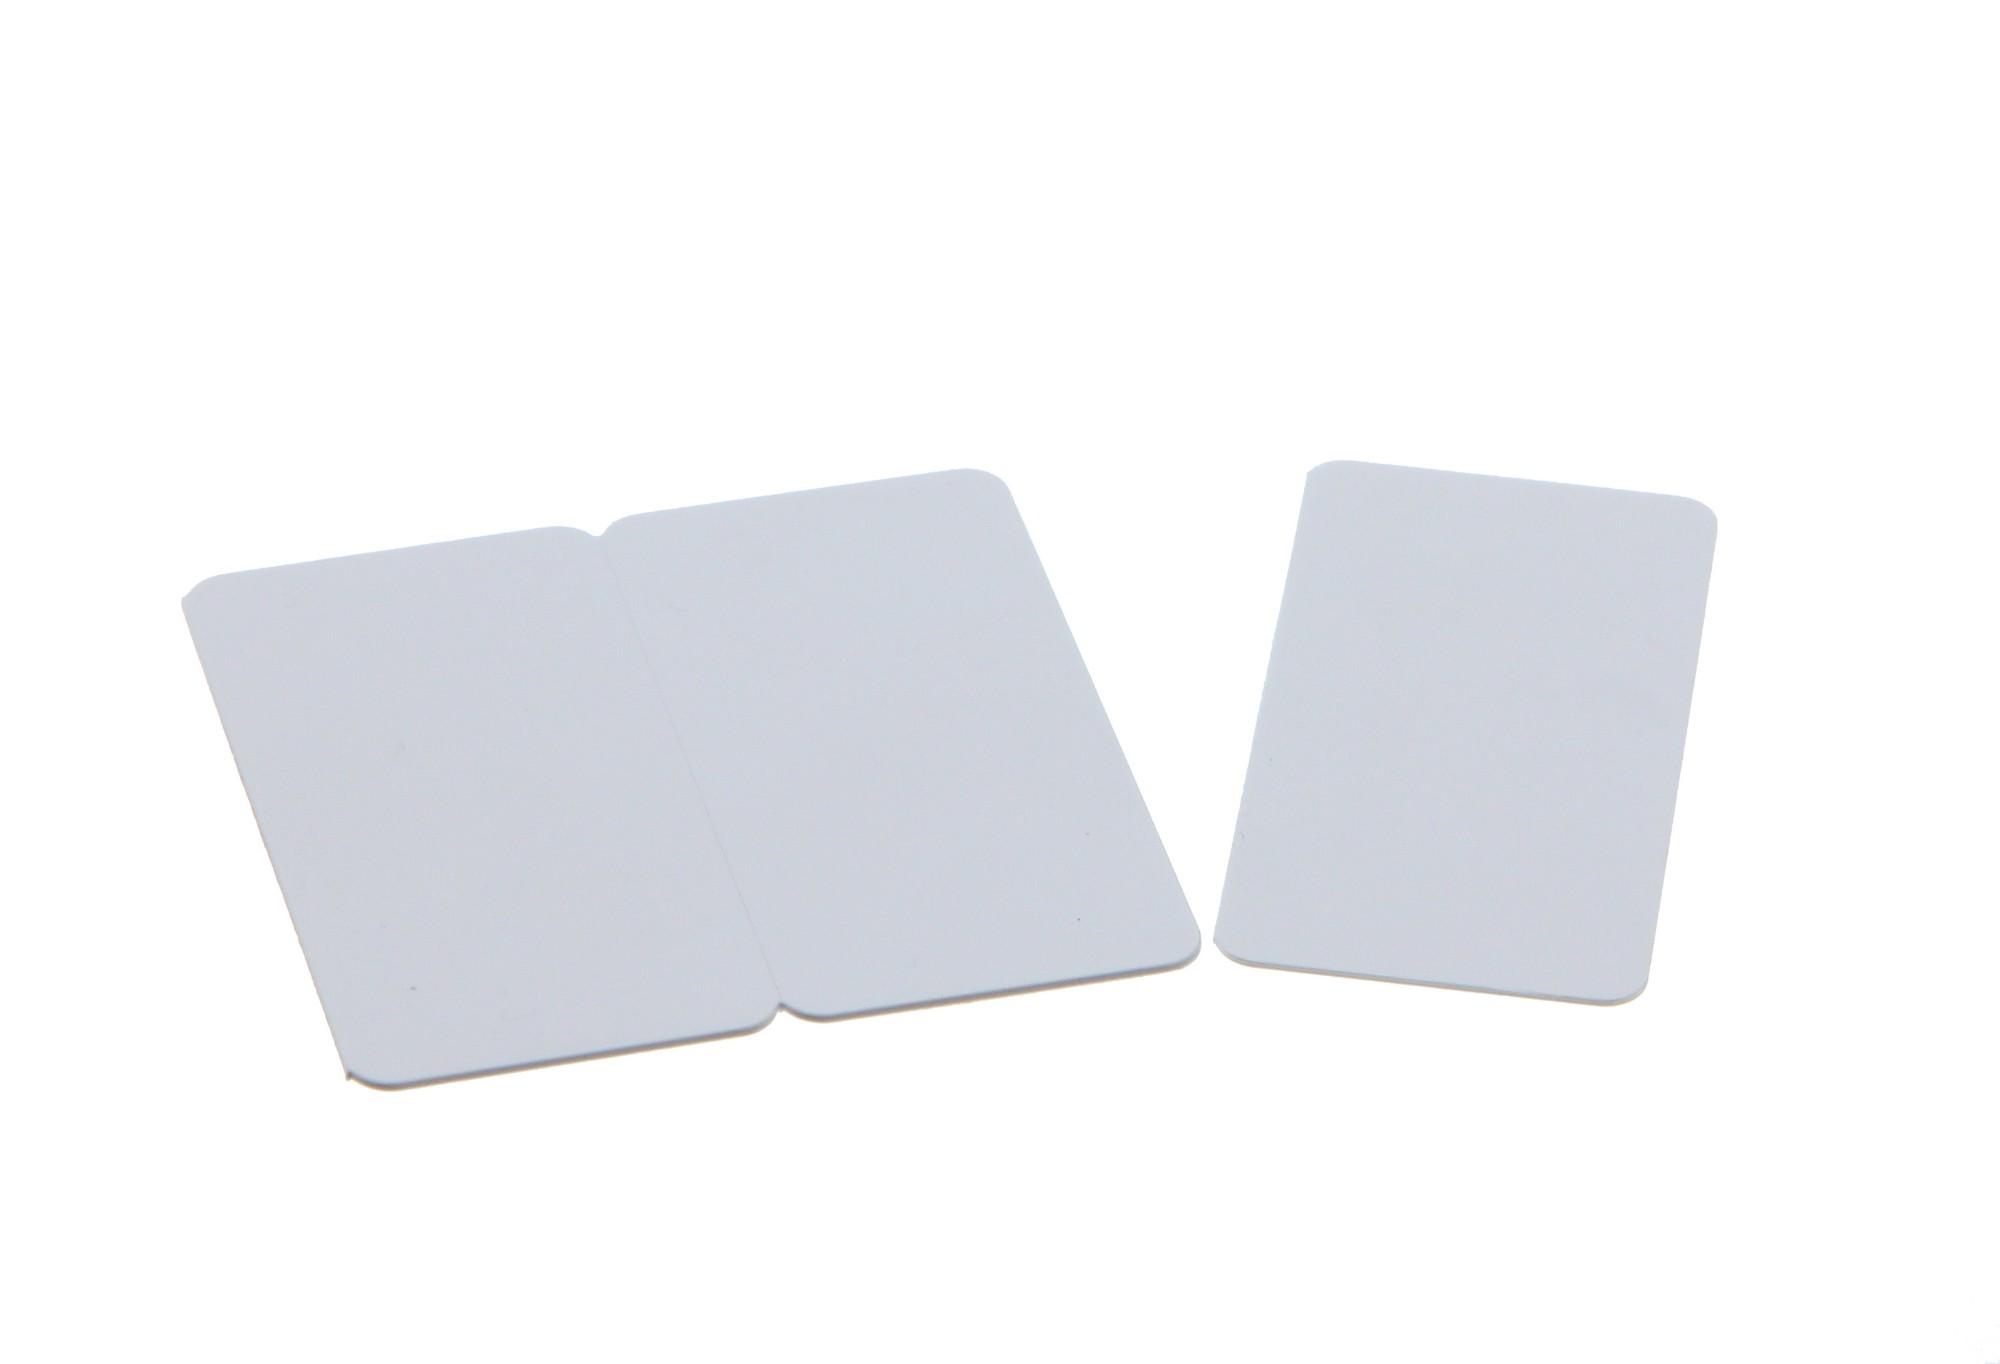 Evolis C4521 blank plastic card